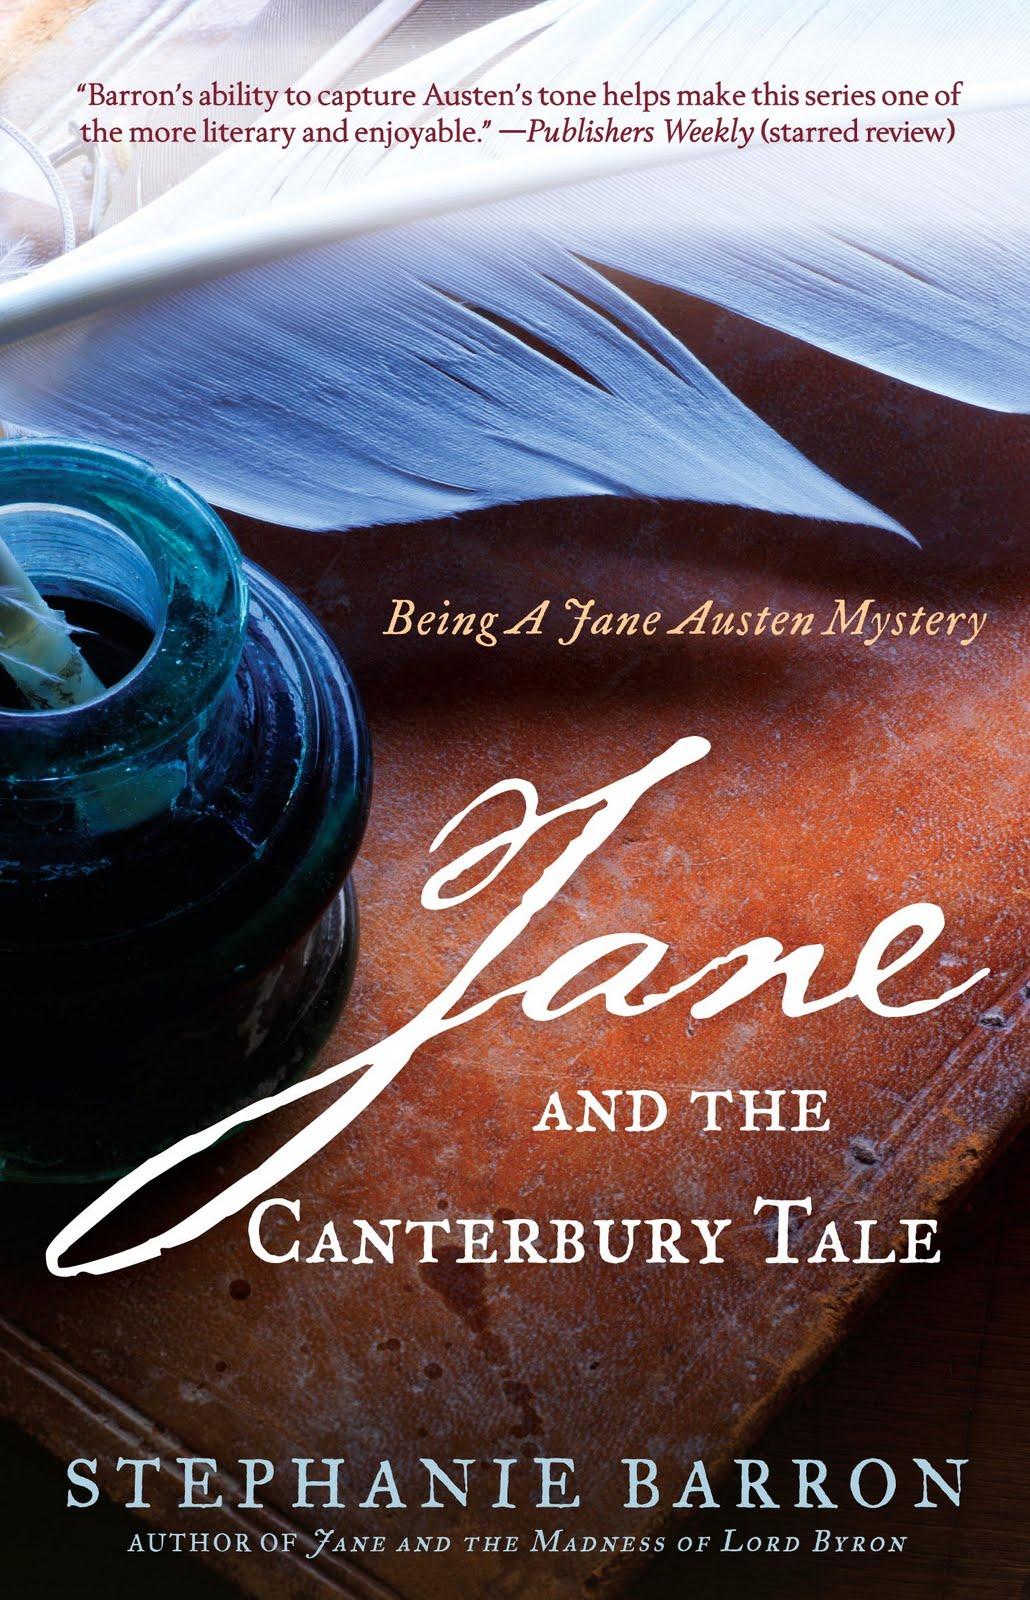 writing about jane austen